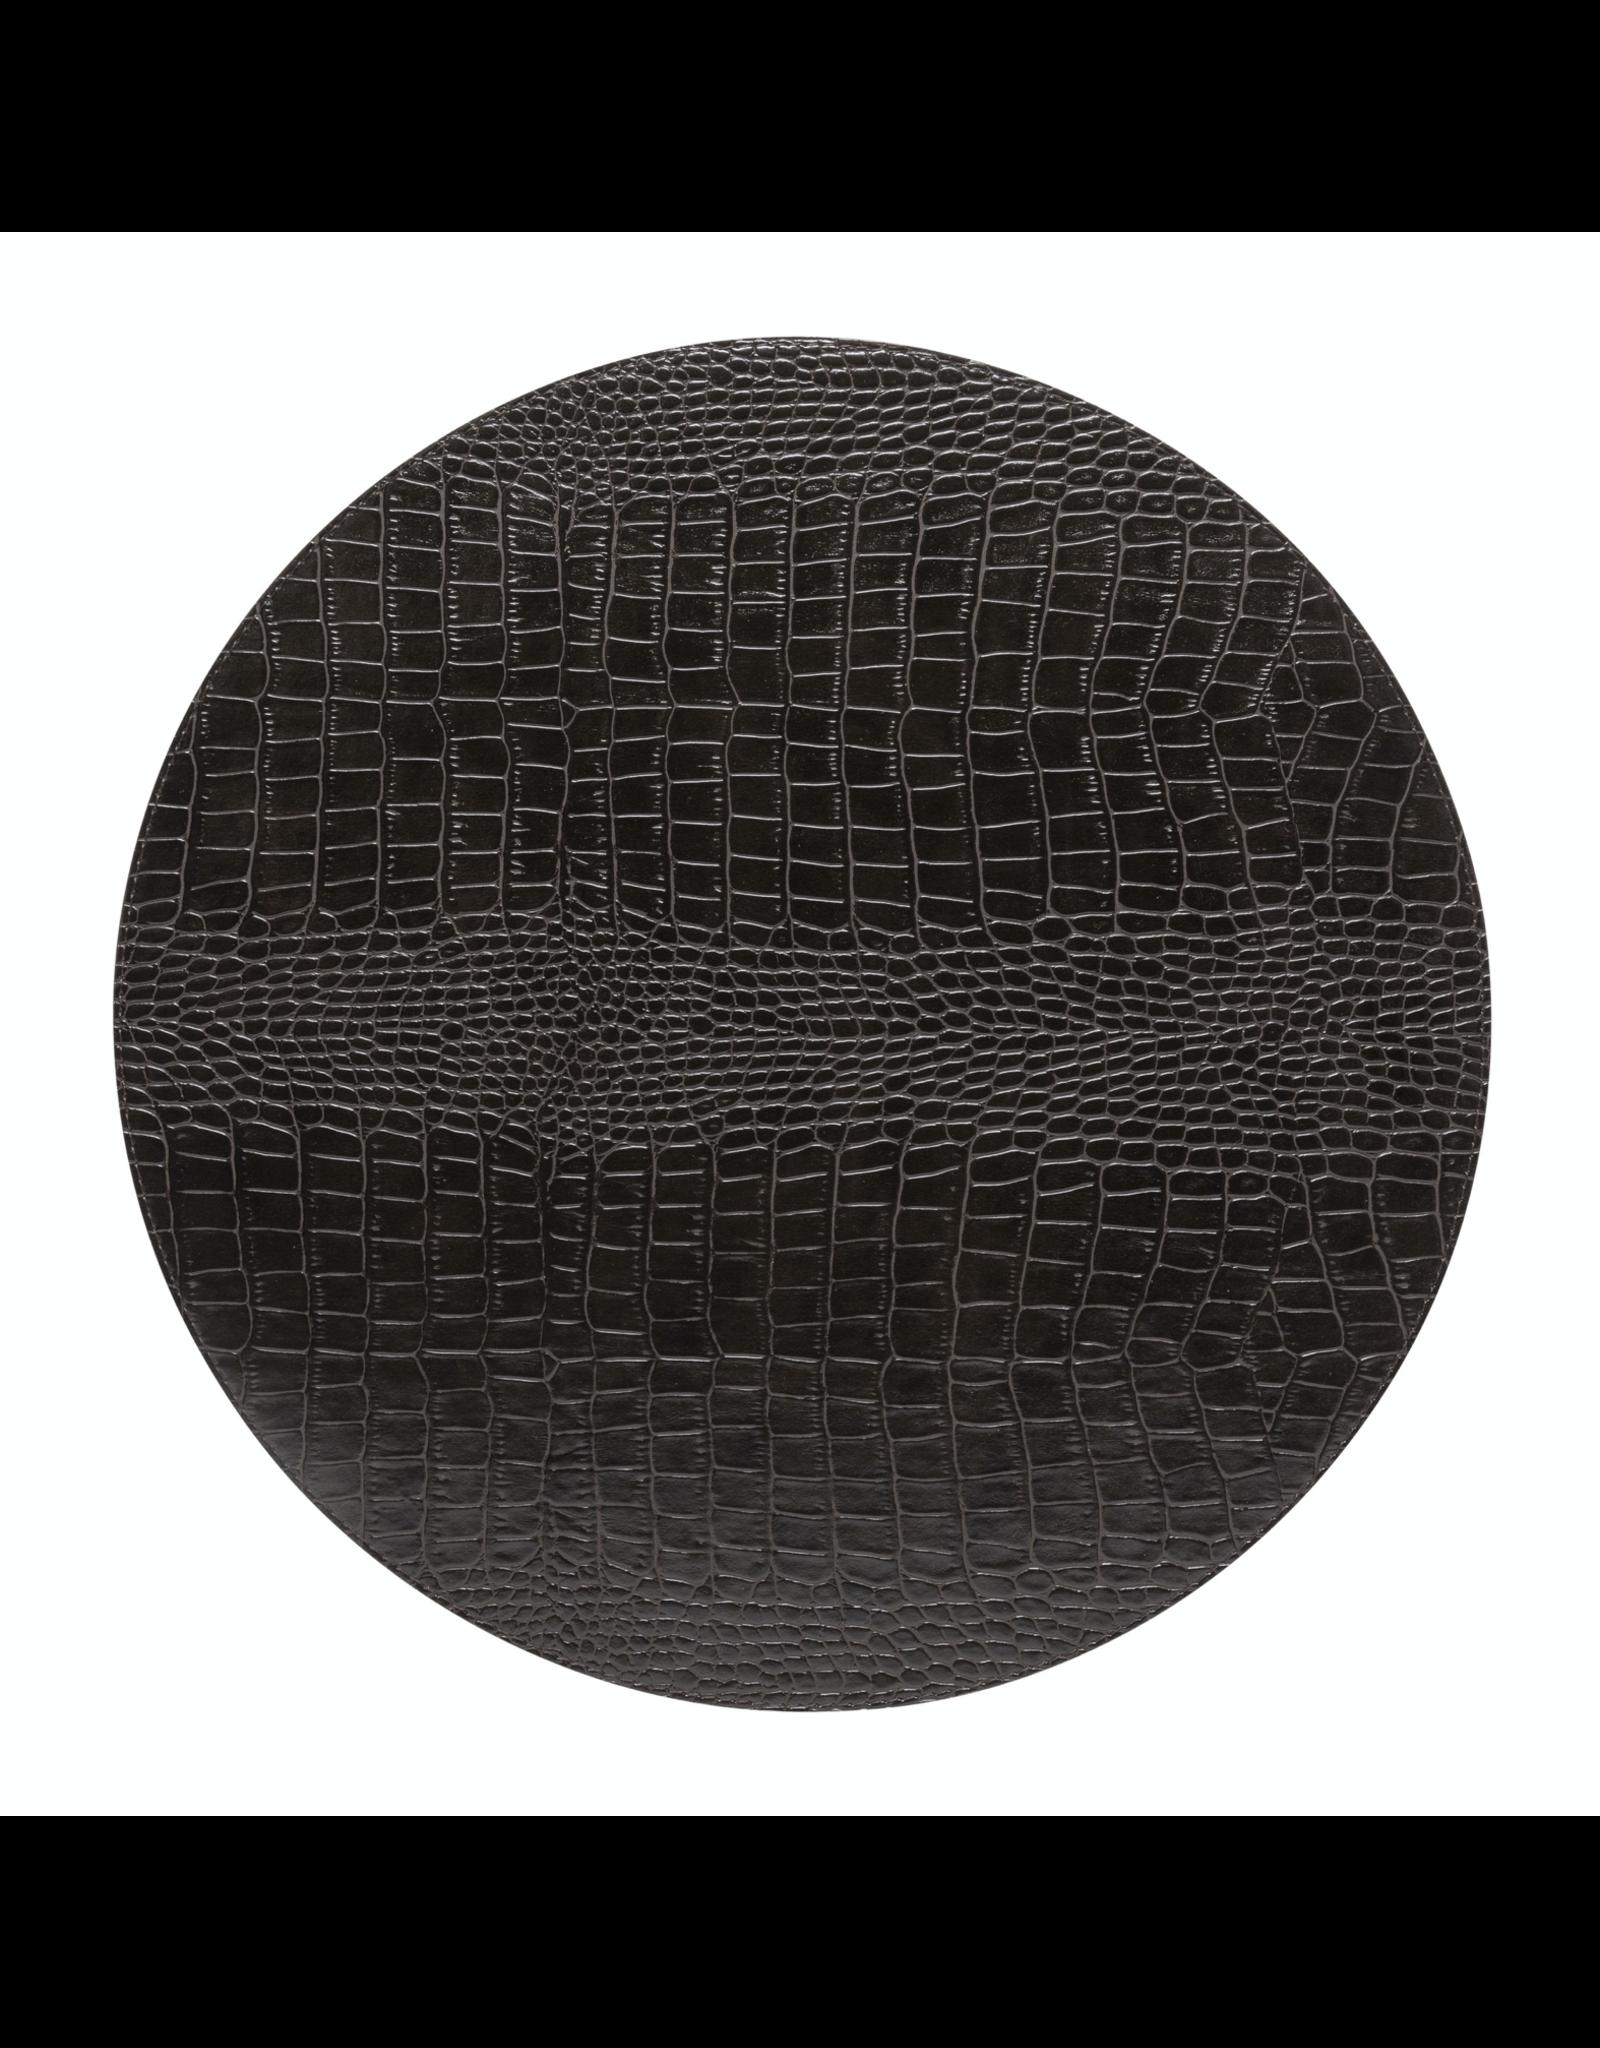 Kitchen Trend Round placemat 100% PU, CLUB, chocolate